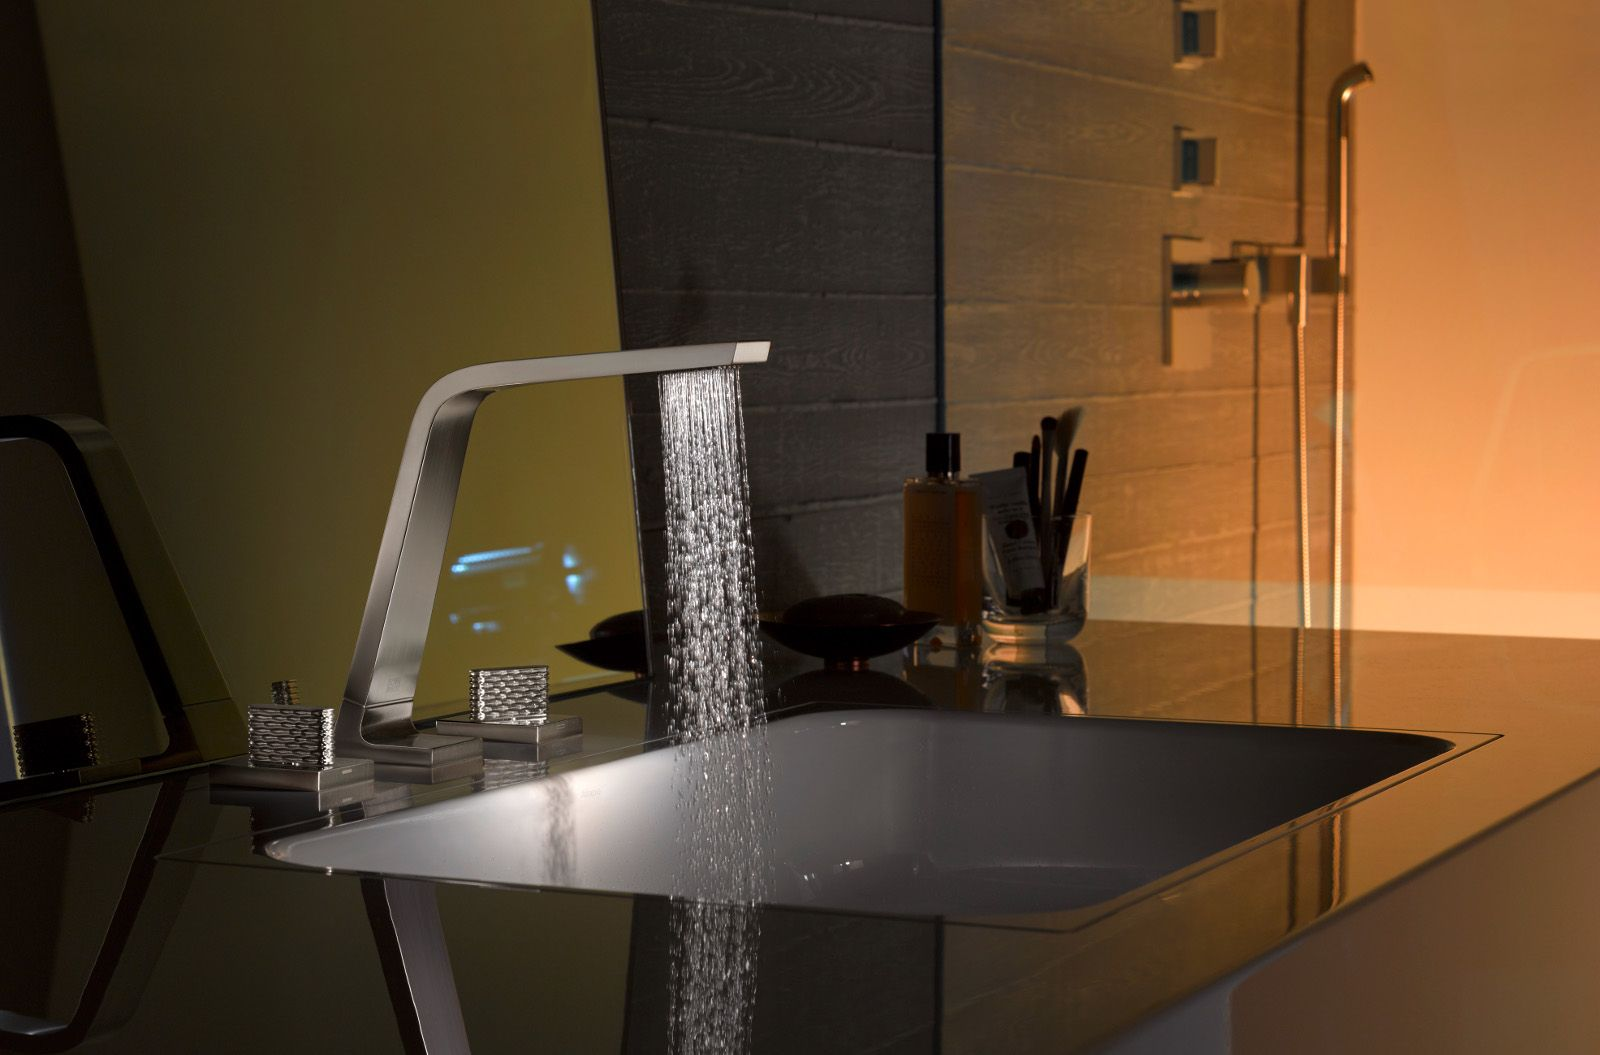 Badezimmer armaturen ~ Designarmatur cl.1 dornbracht bad dornbracht bath & spa